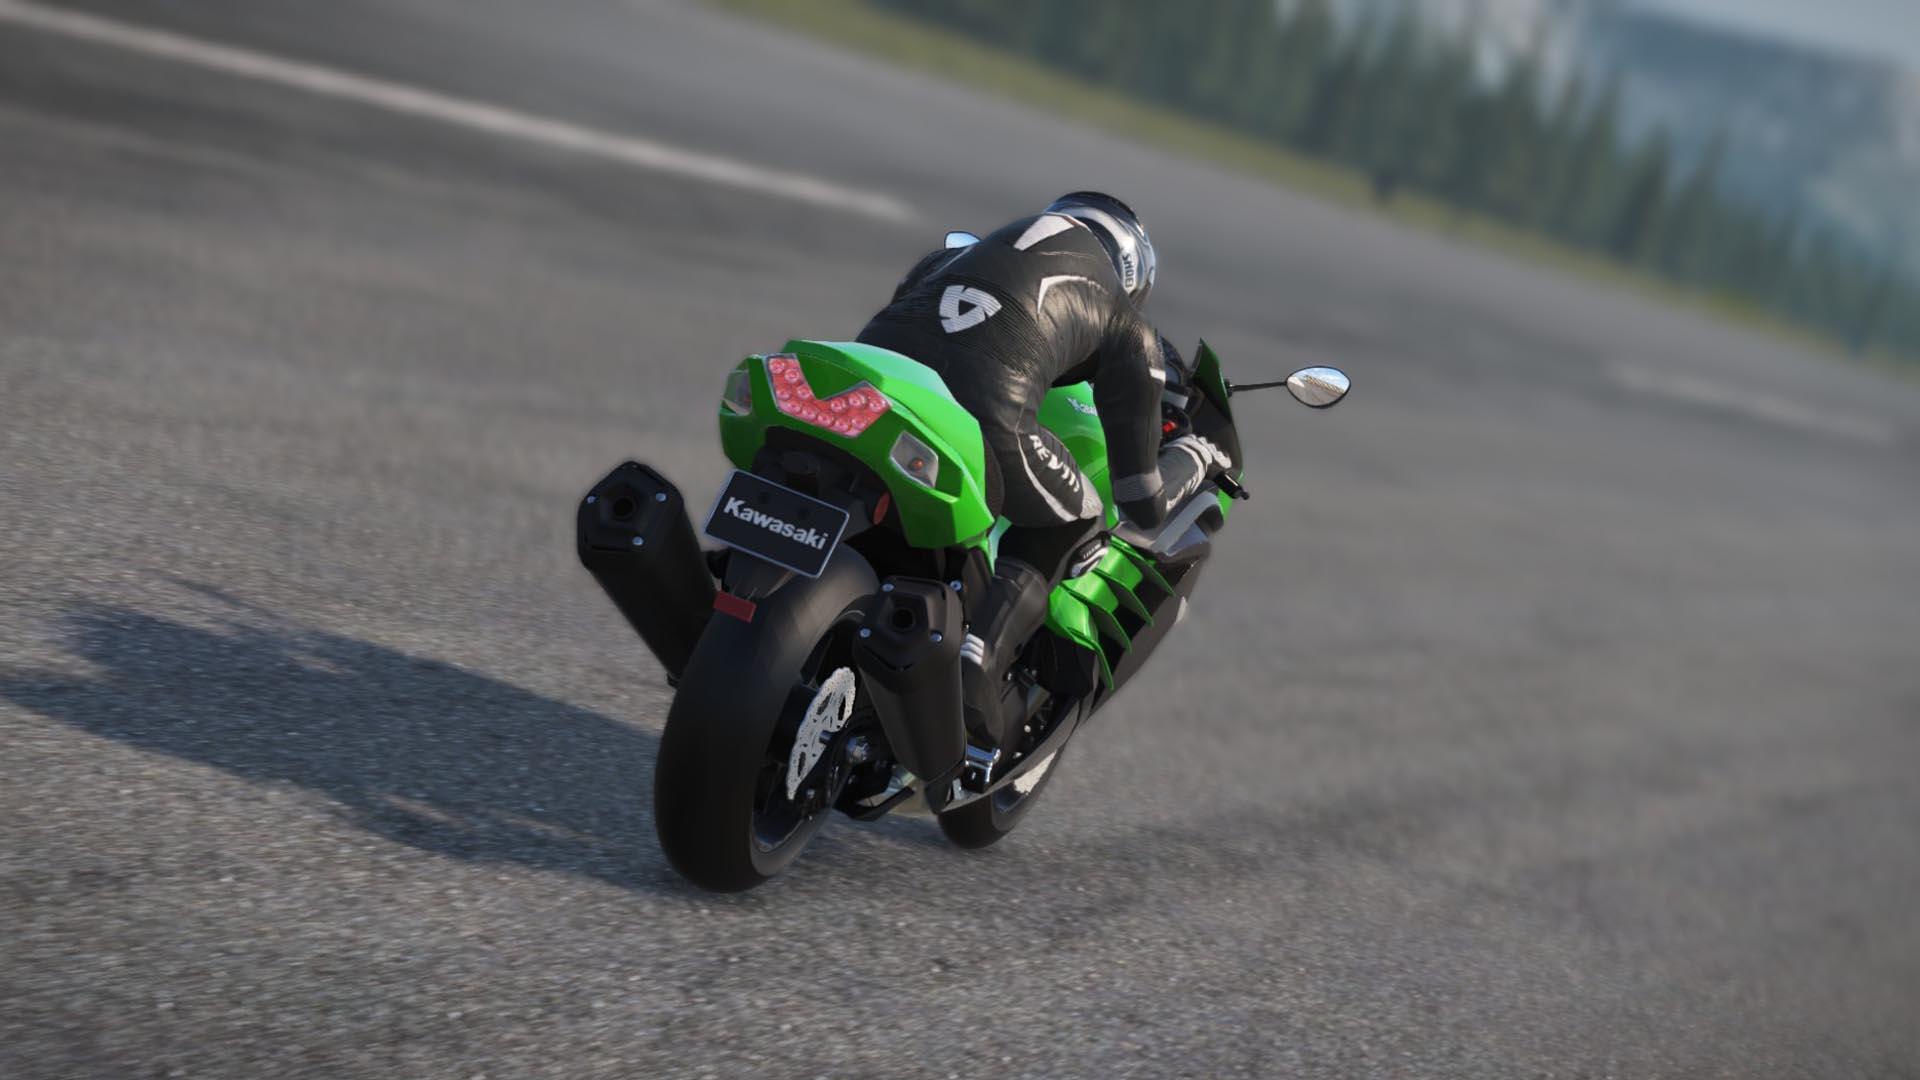 Ride 2 Kawasaki and Ducati Bonus Pack